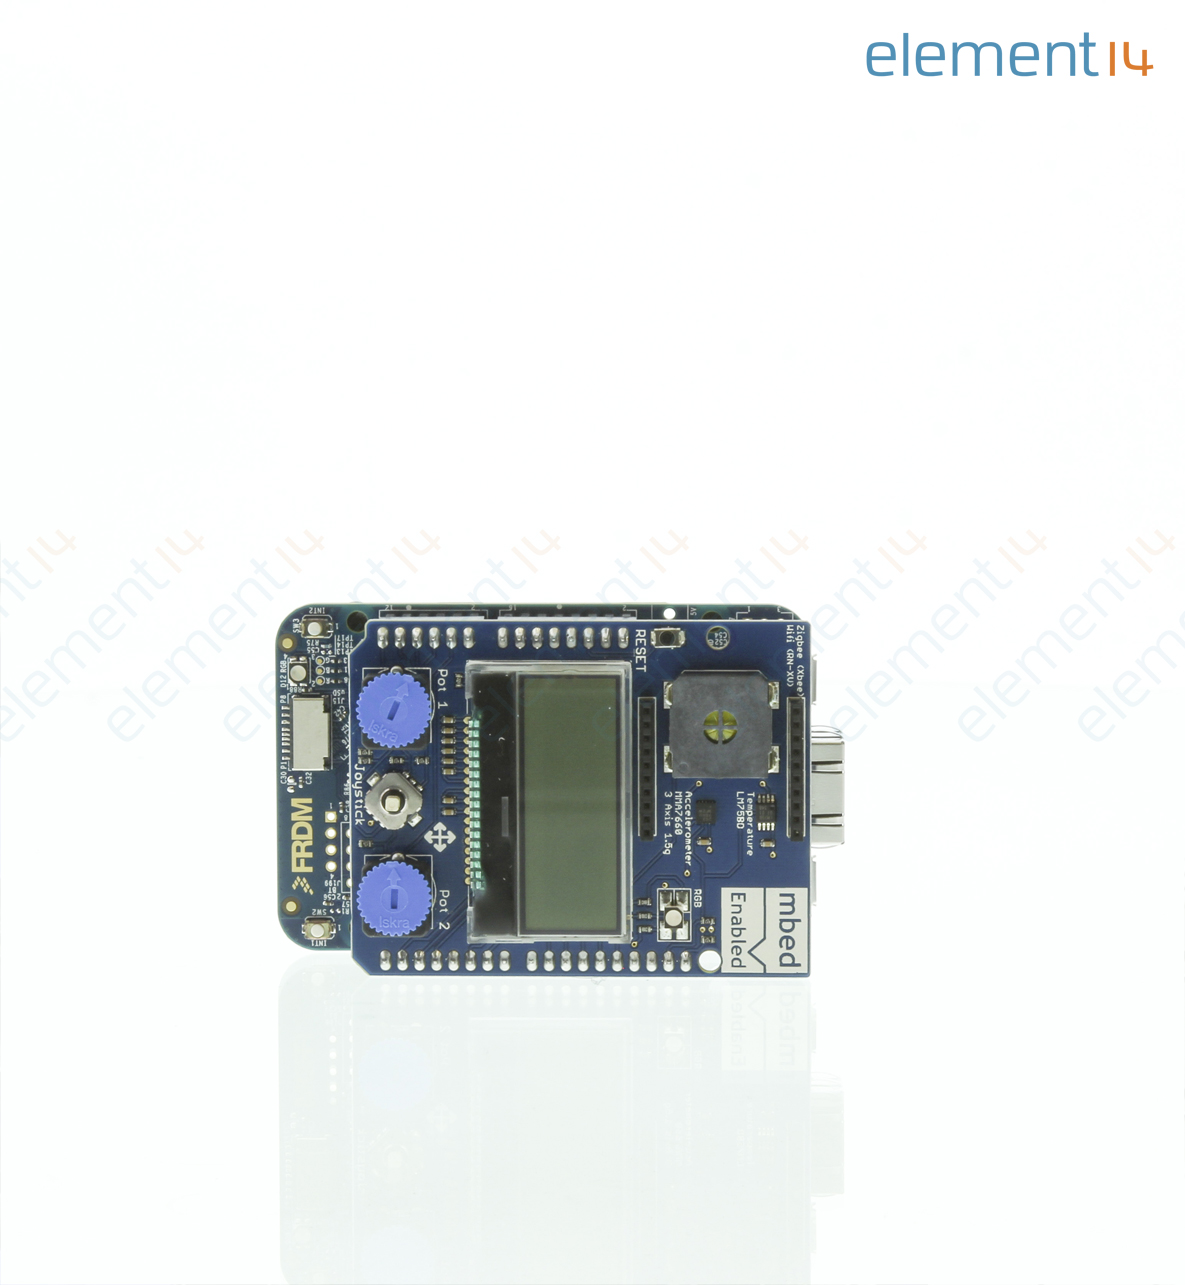 Starter Kit Development Board IOT, IBM-MBED, 32bit, High Performance 120MHz  CPU